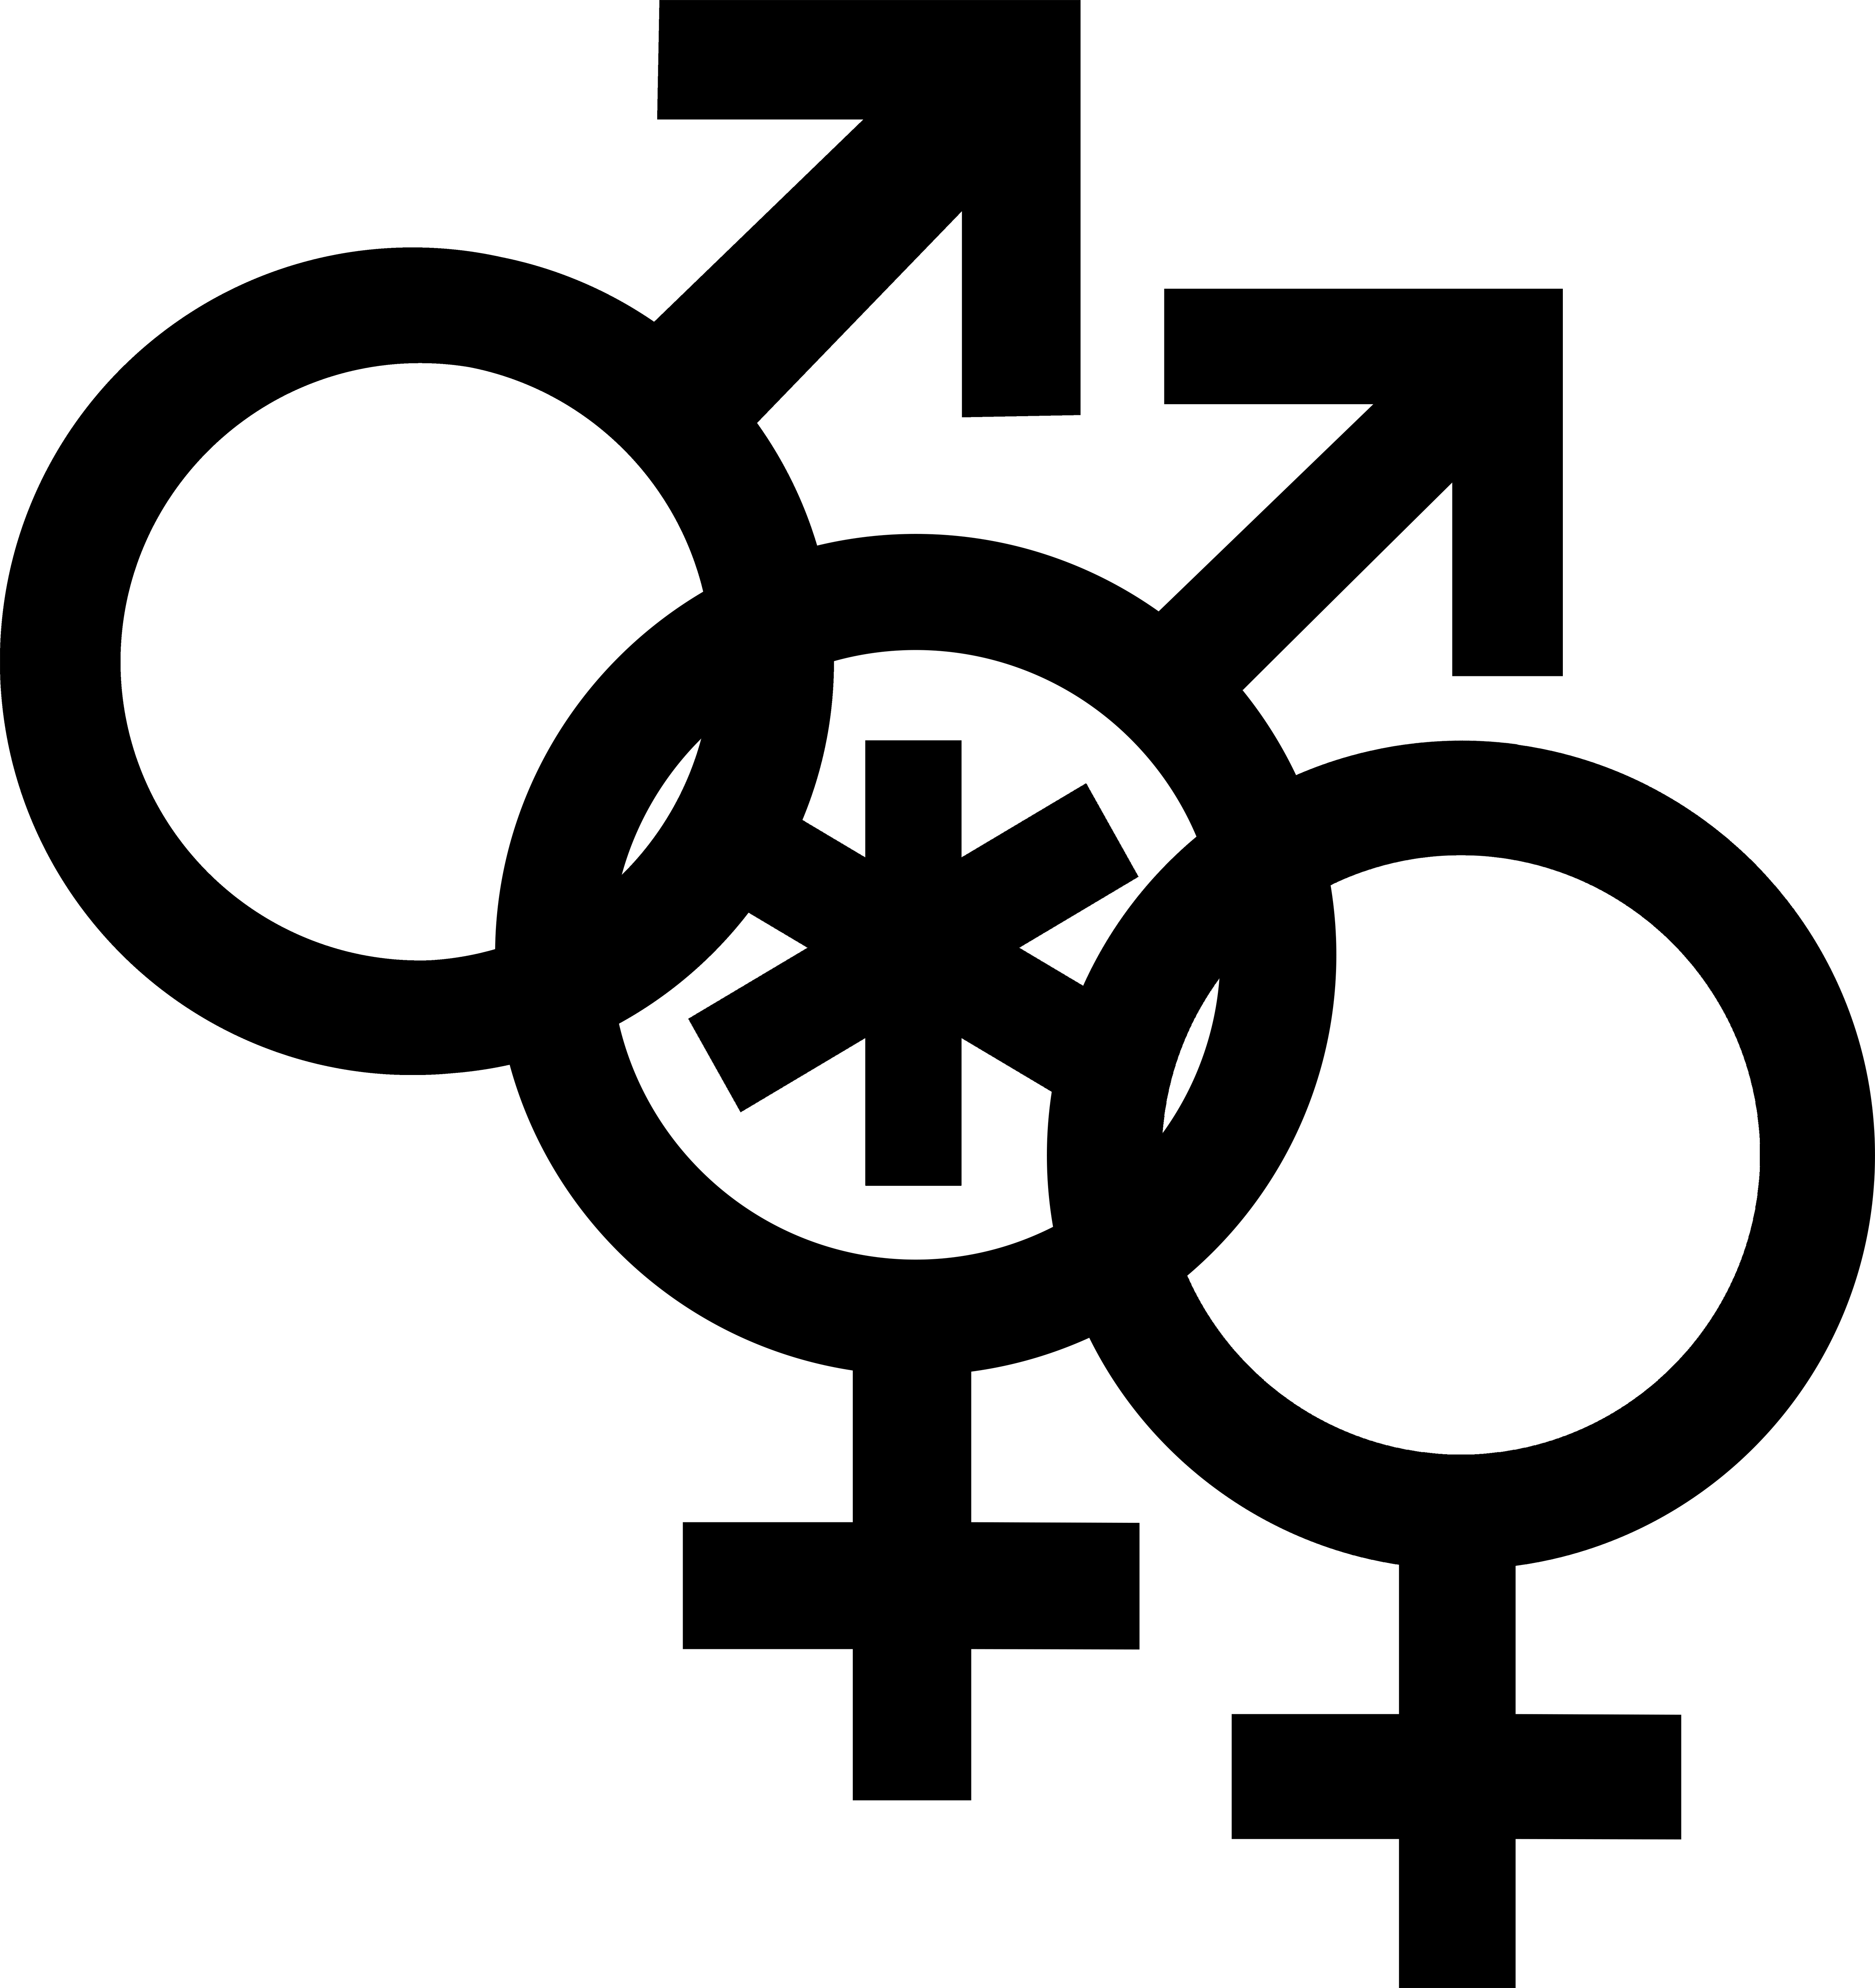 Nonbinary man symbol interlocked with a Mars symbol and a Venus symbol.